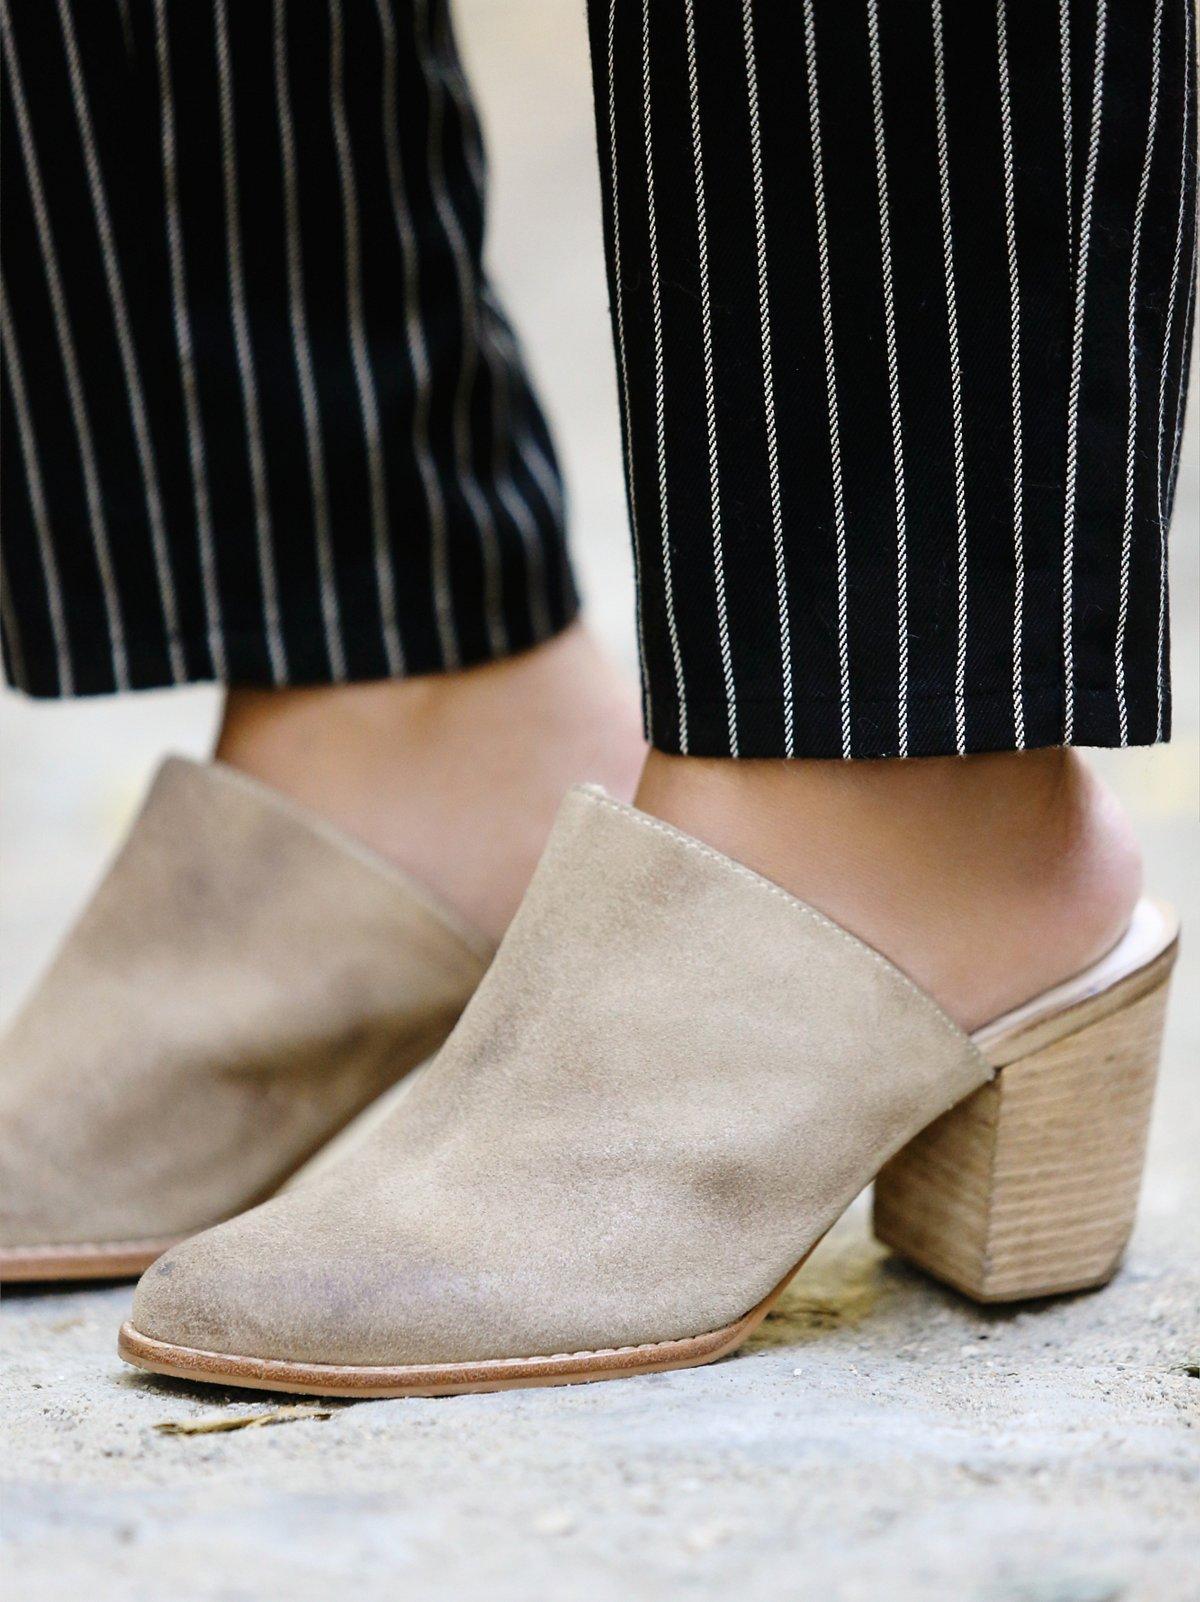 Easton穆勒鞋